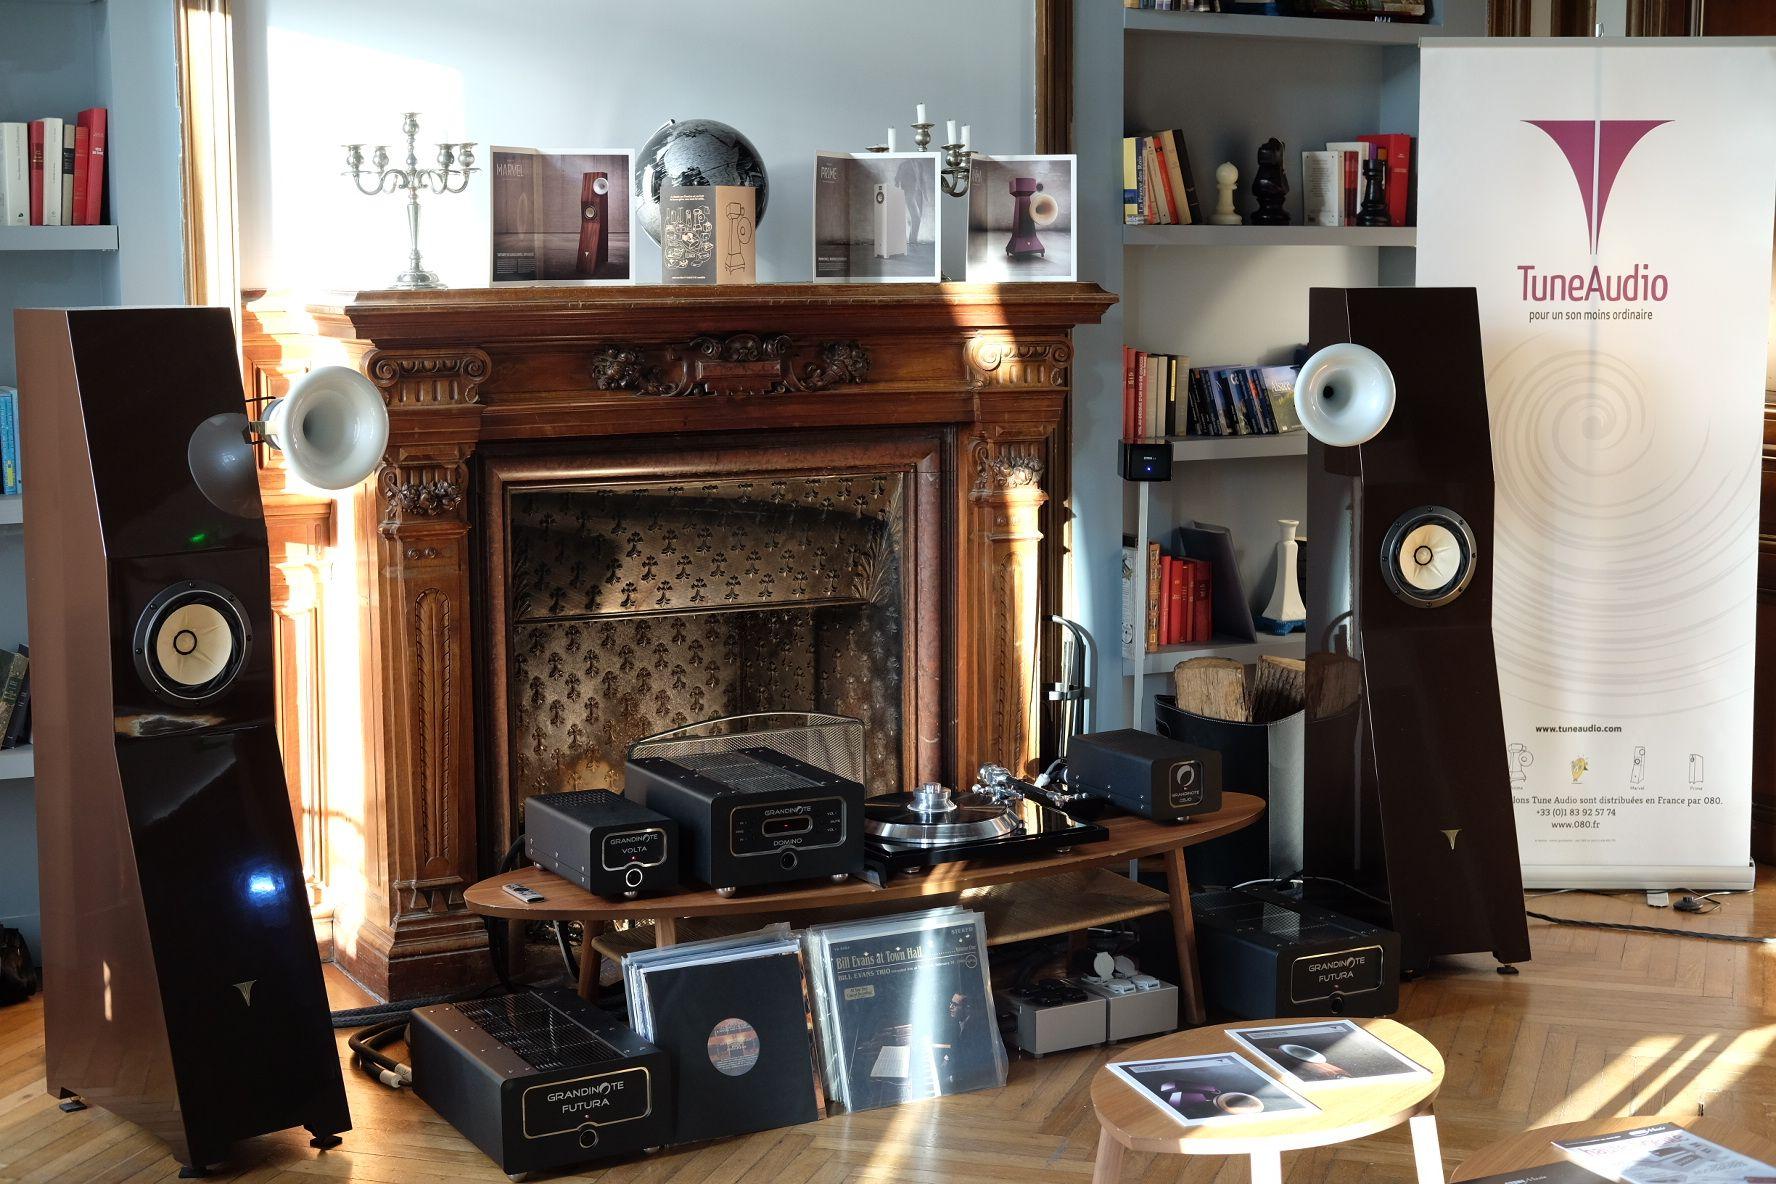 Loudspeaker Tune Audio Marvel Amplification Grandinote Sources